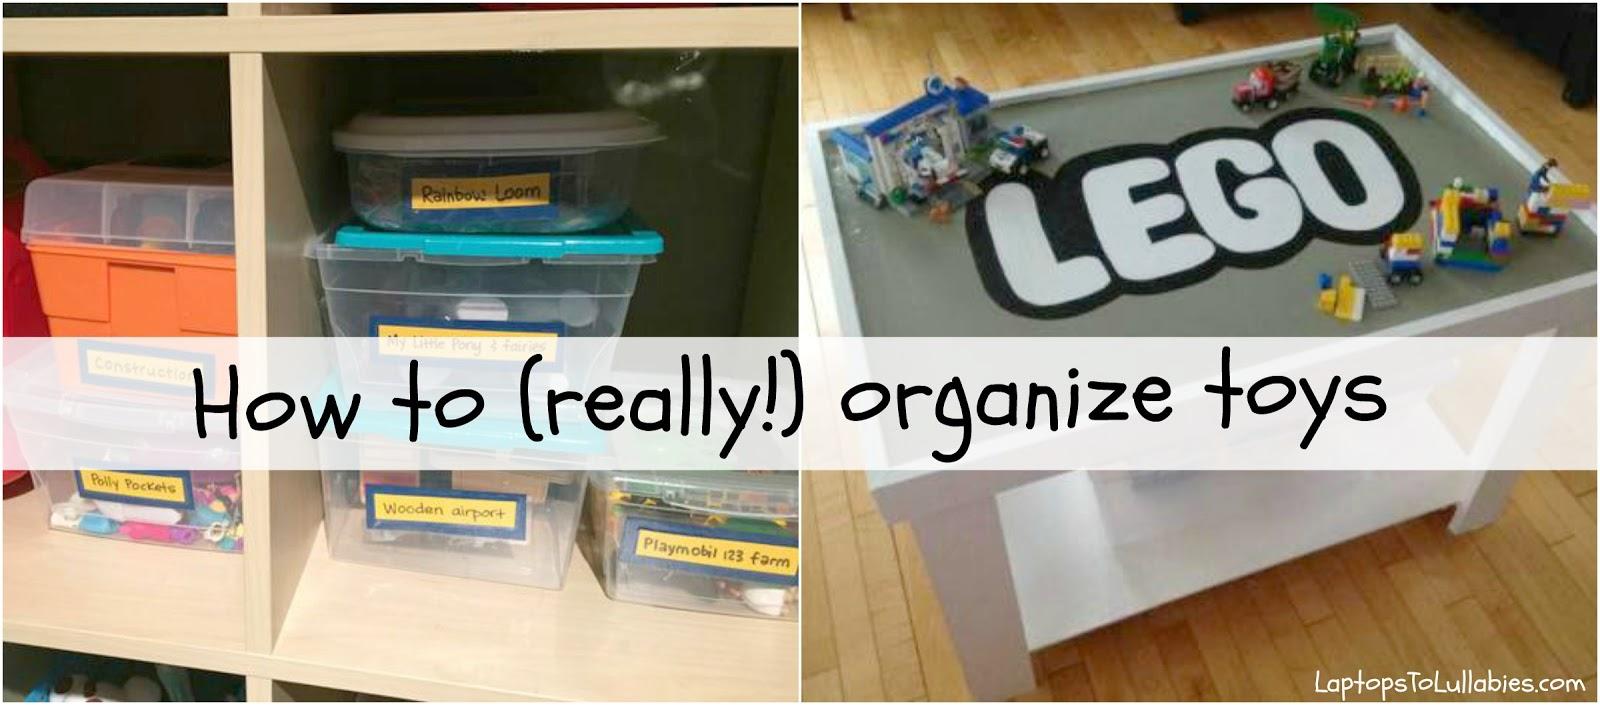 Laptops to Lullabies: Toy organization tips